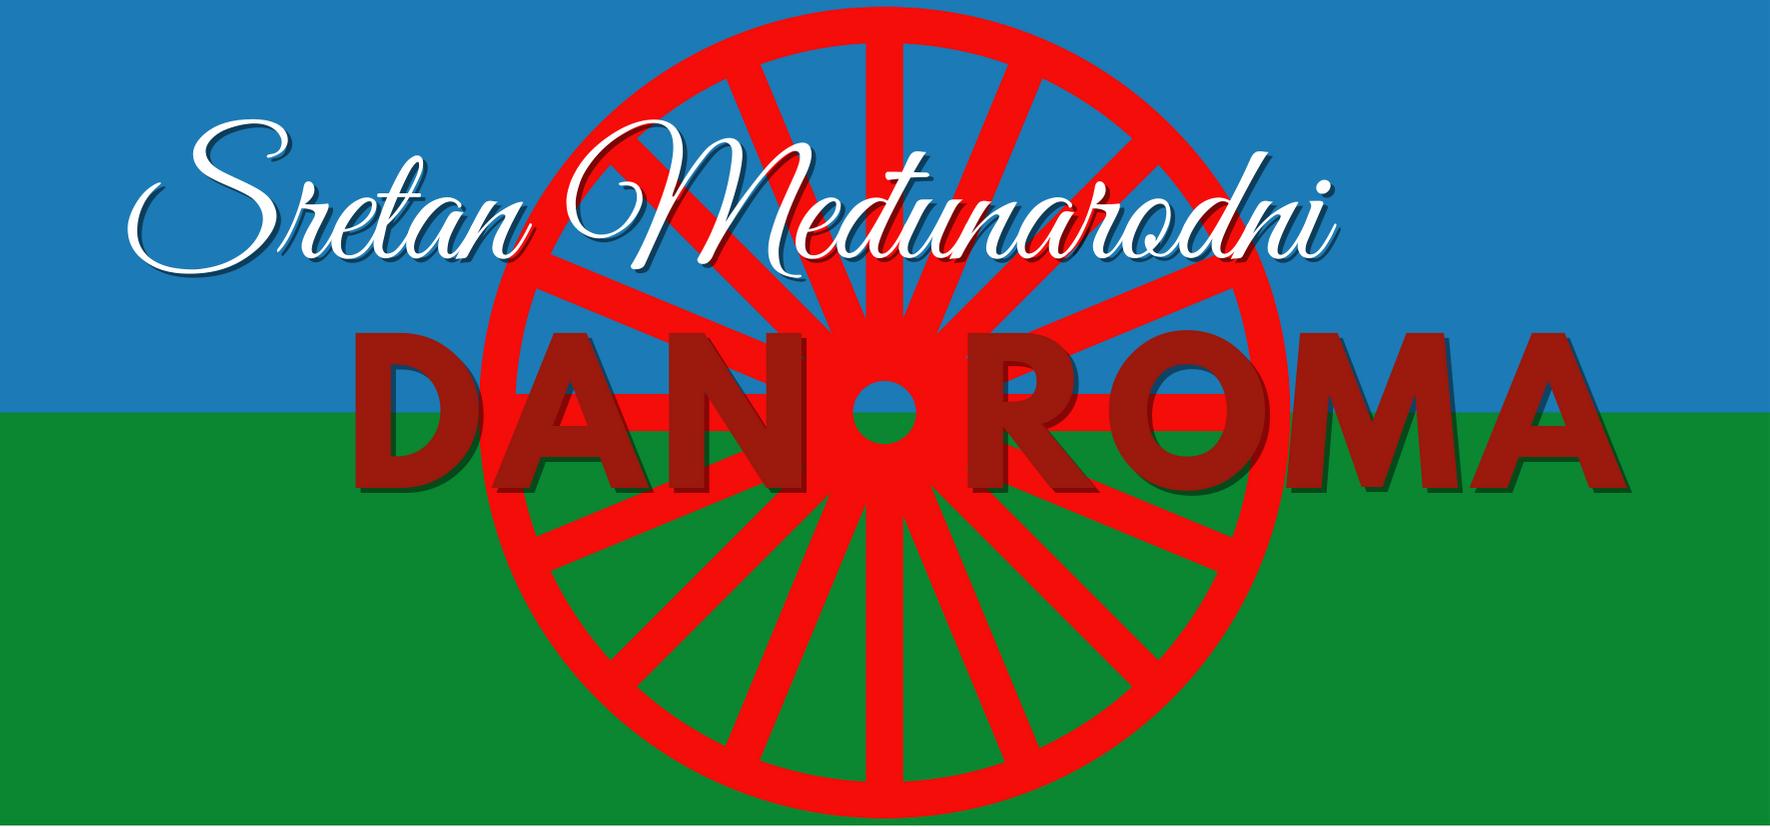 Hrv 3 sretan dan roma SRETAN MEĐUNARODNI DAN ROMA